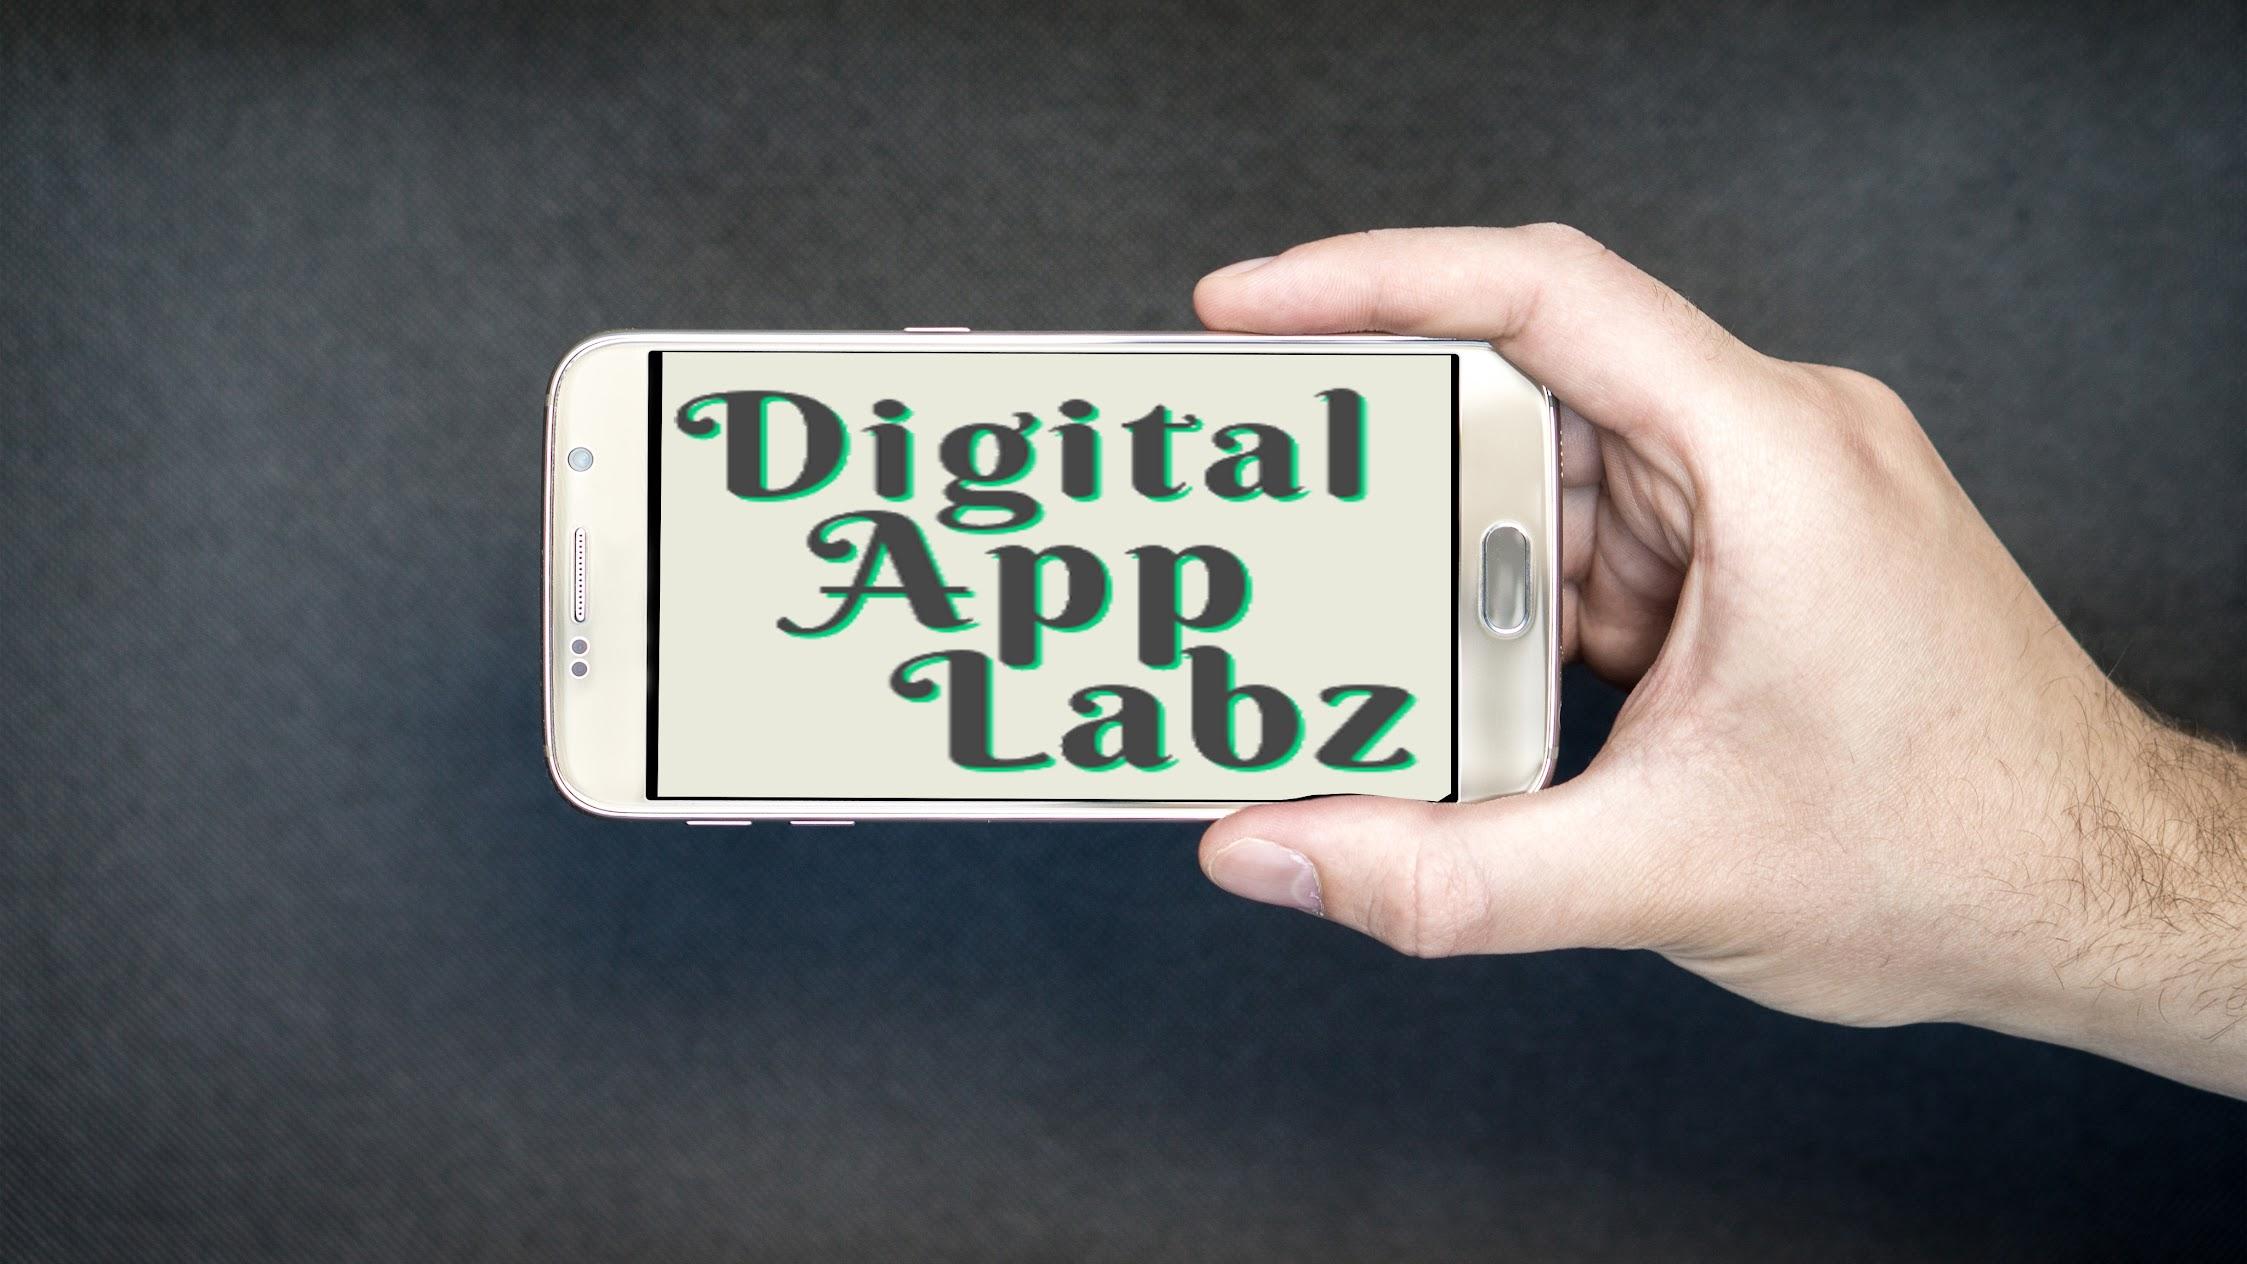 Digital App Labz